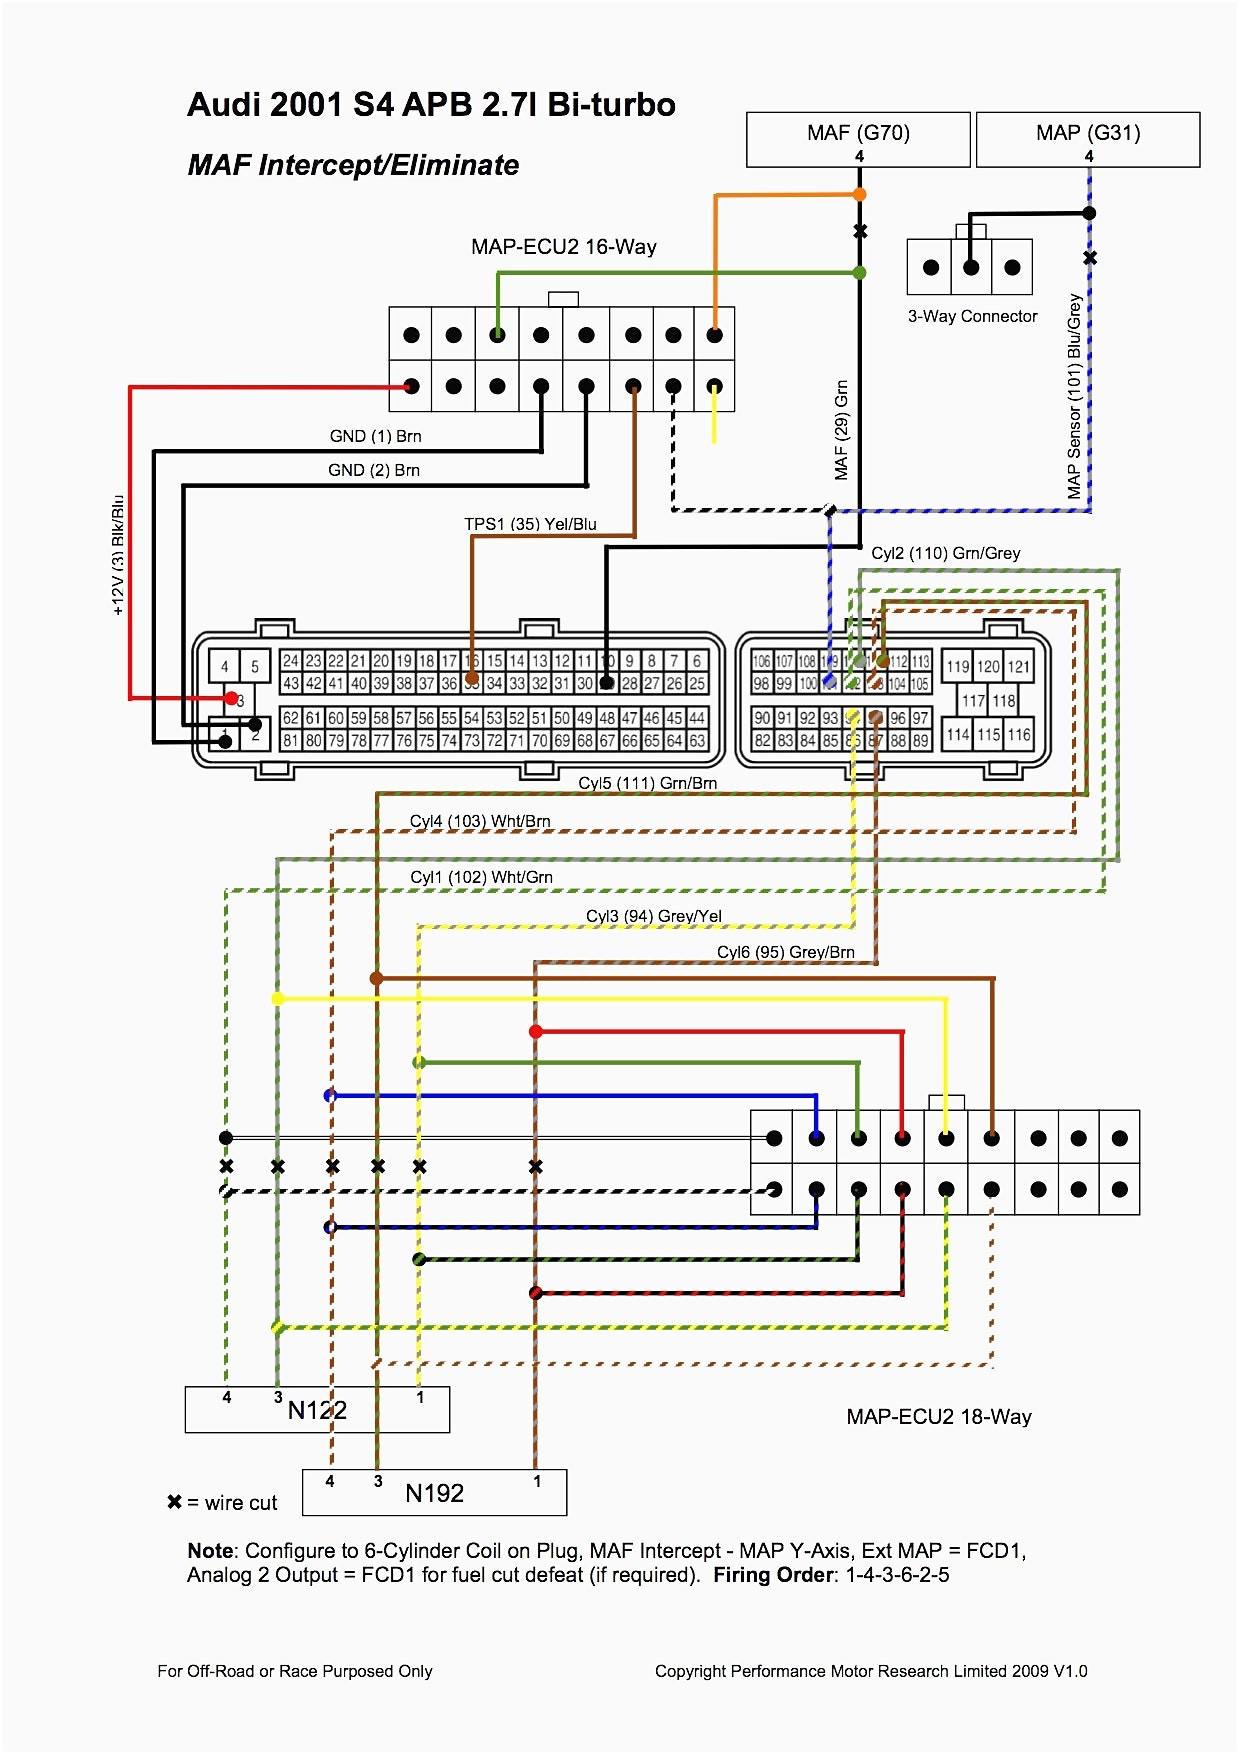 2002 Mitsubishi Galant Engine Diagram Wiring Diagram Mitsubishi Lancer Wiring Diagrams • Of 2002 Mitsubishi Galant Engine Diagram